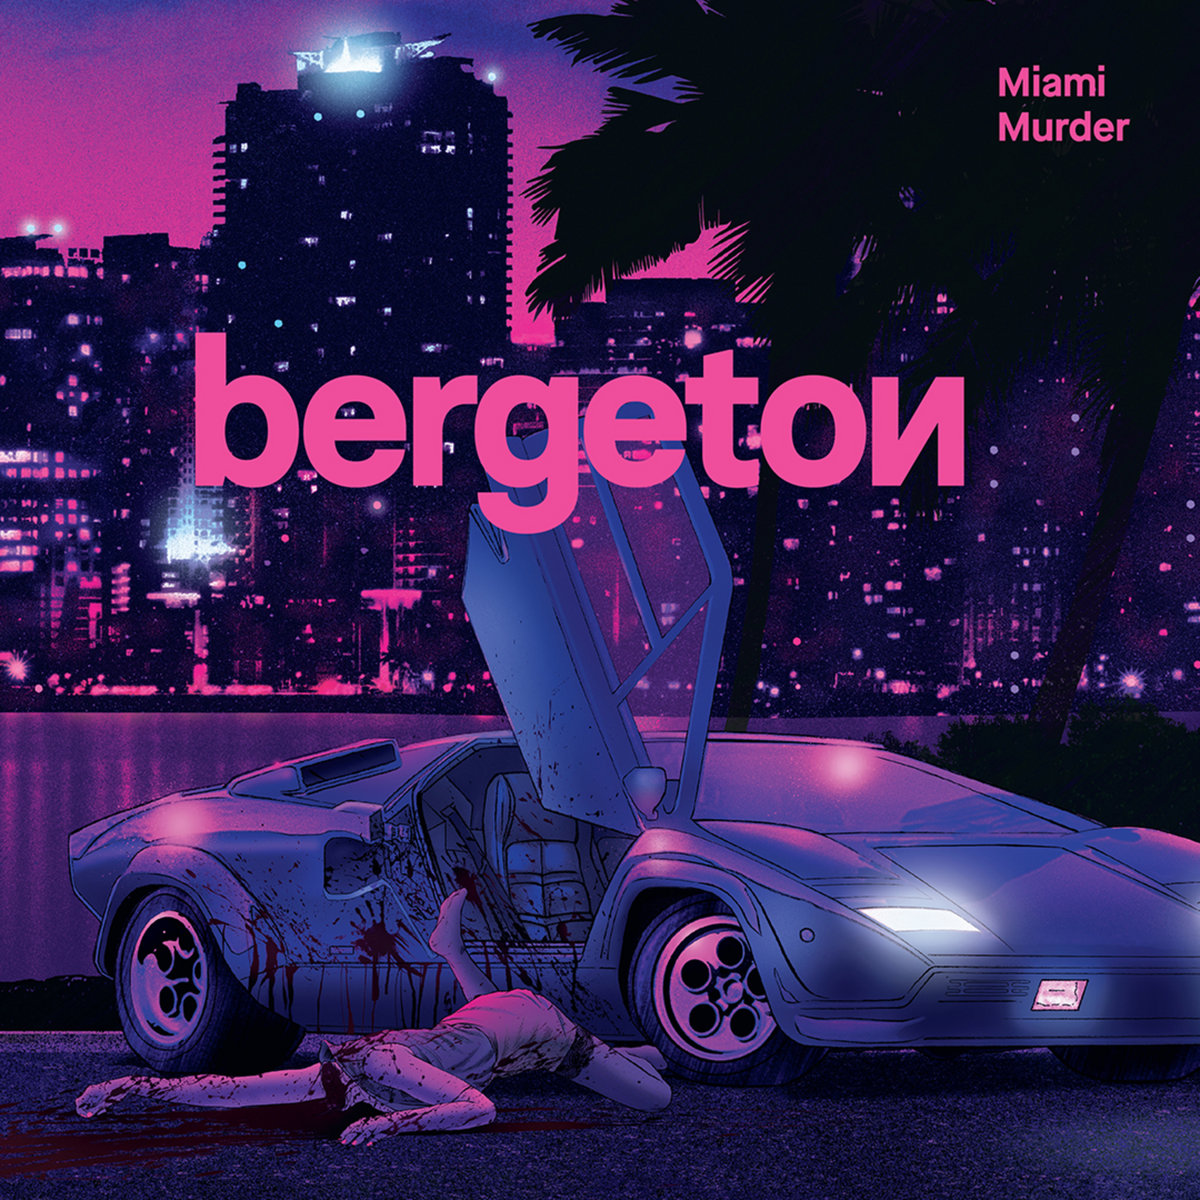 Bergeton: Miami Murder